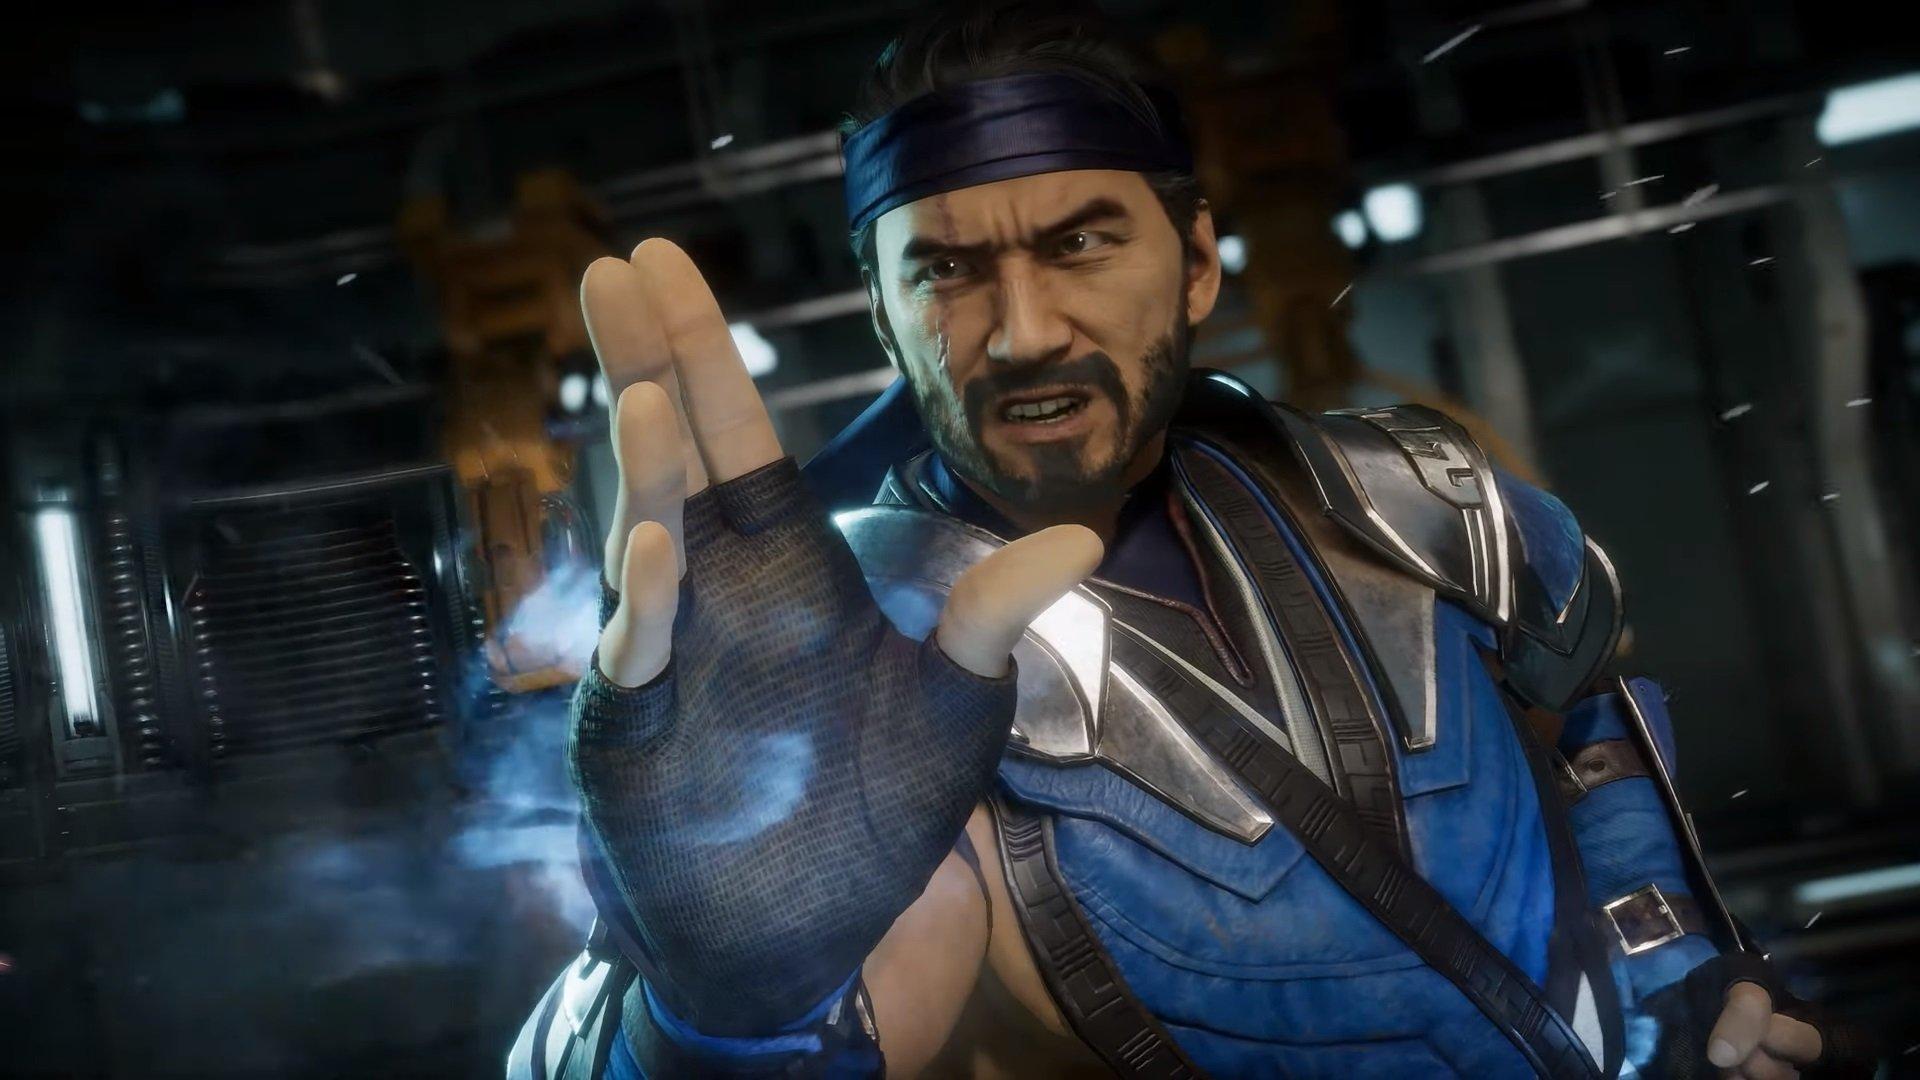 Mortal Kombat 11 - 5 announcer packs we want to see | Shacknews